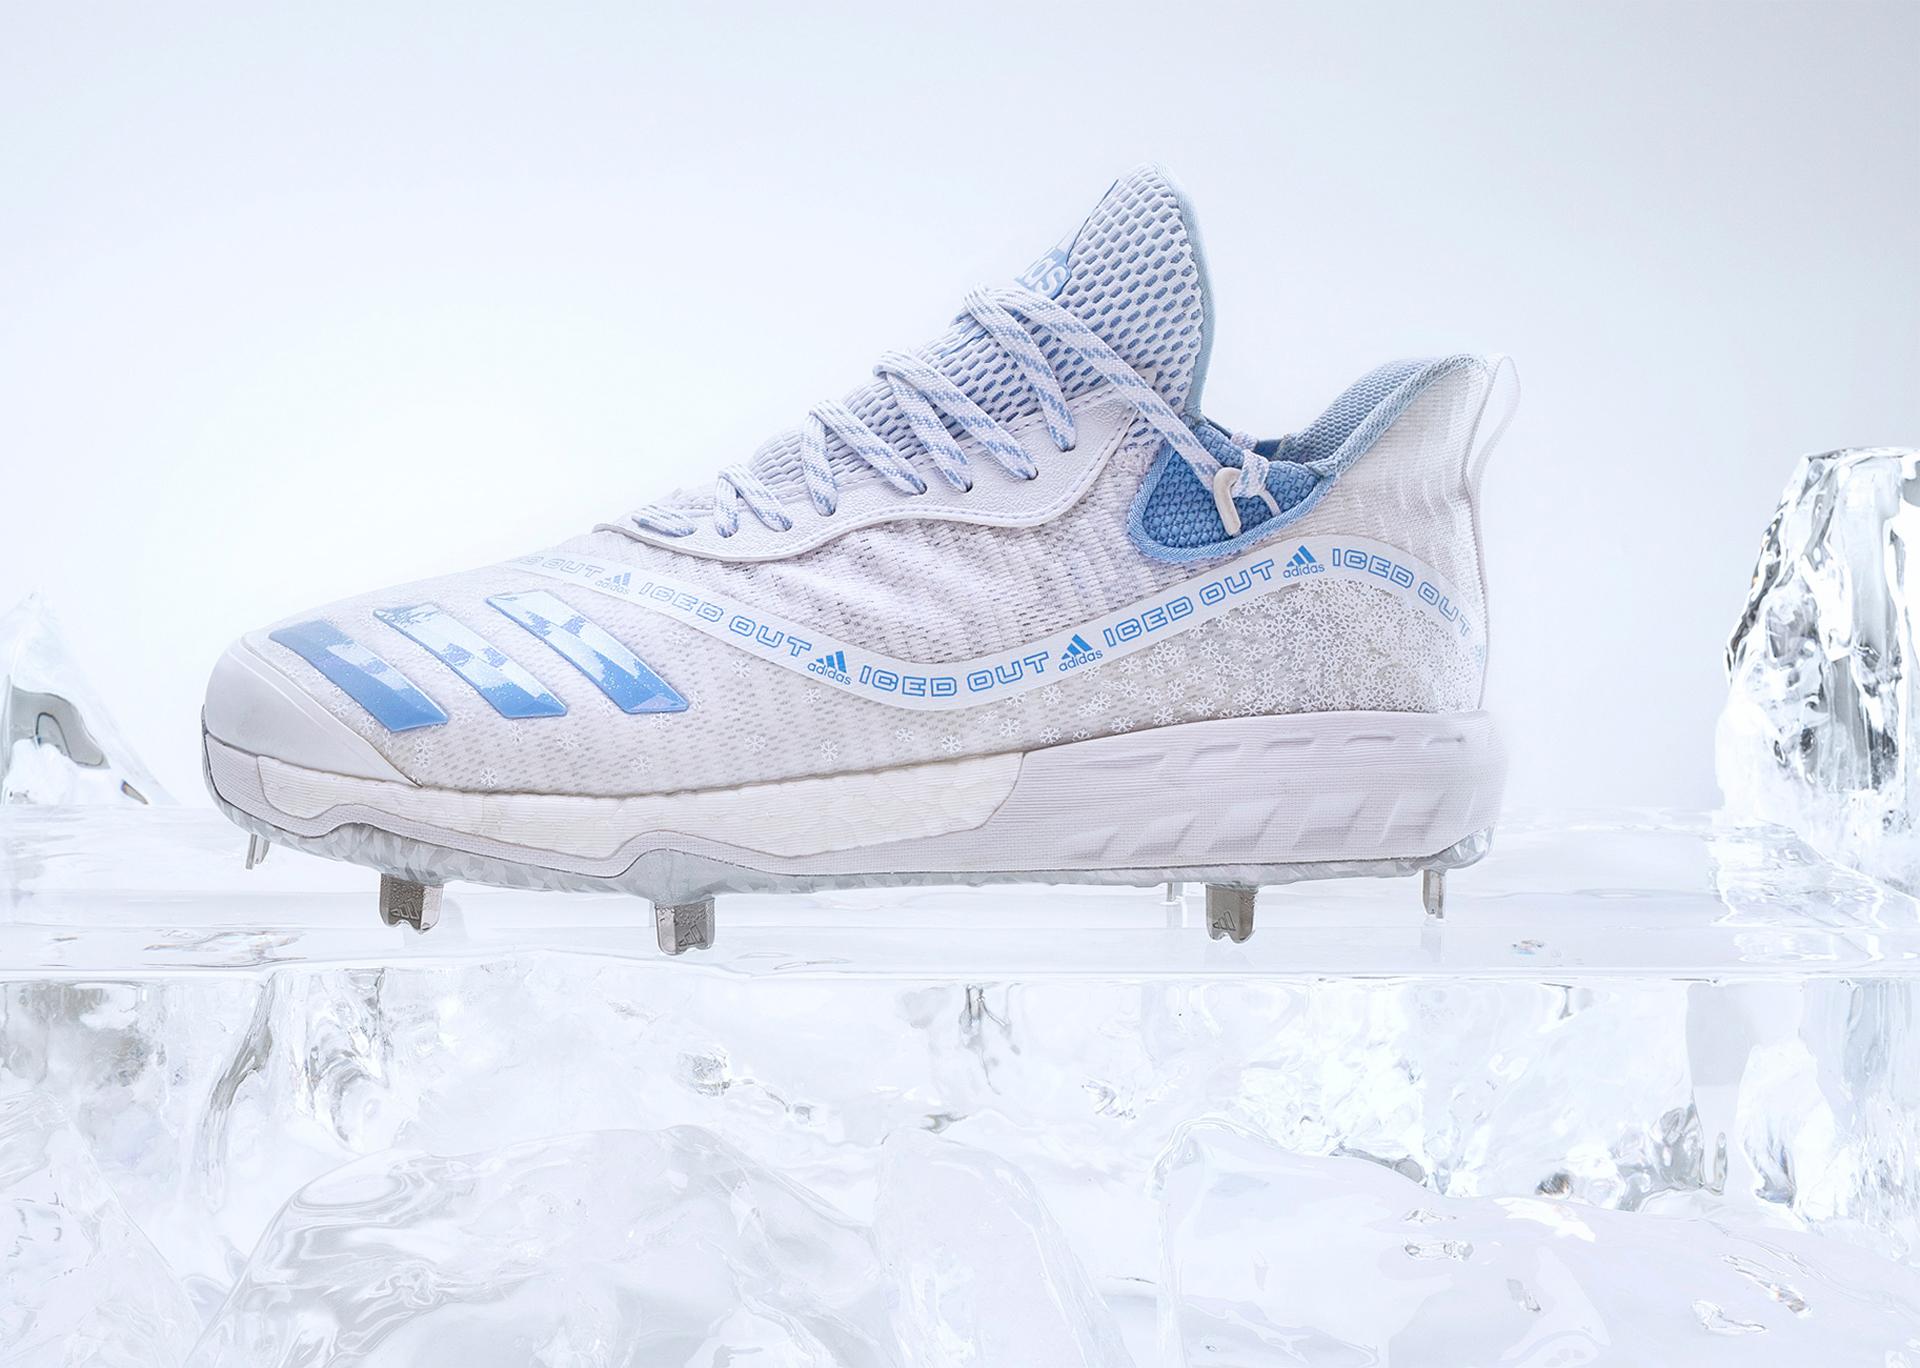 2019 adidas baseball cleats